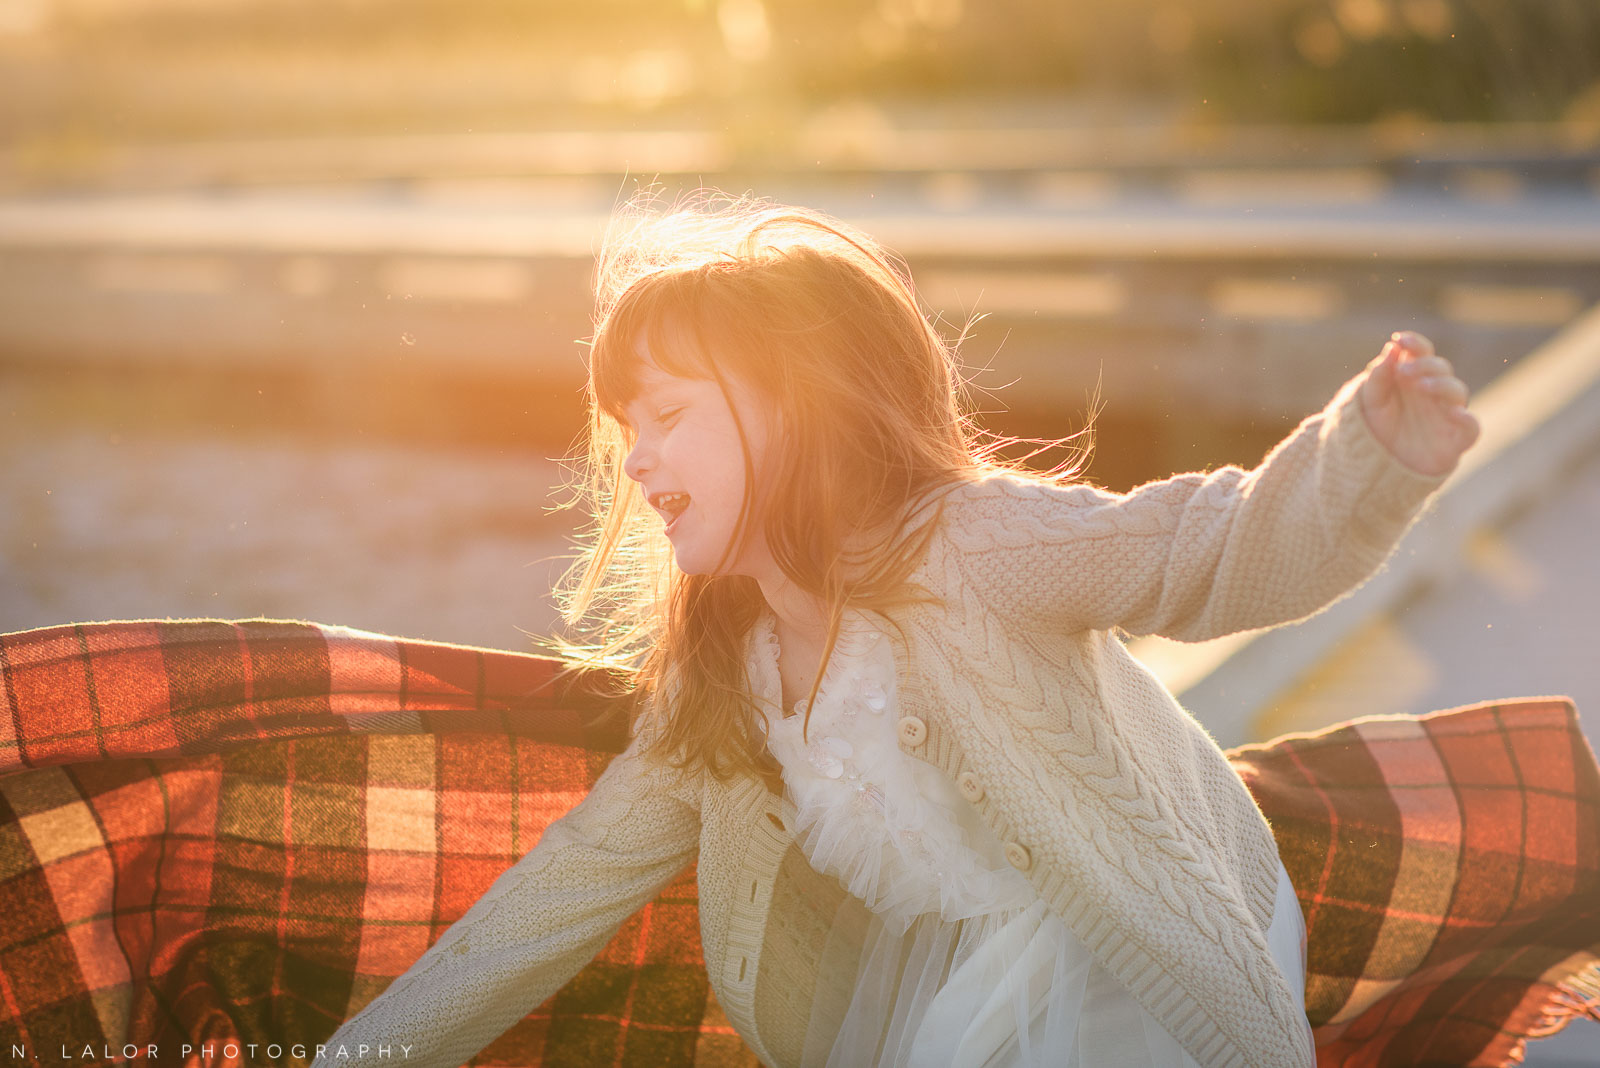 nlalor-photography-2015-10-04-gwen-beach-session-16.jpg